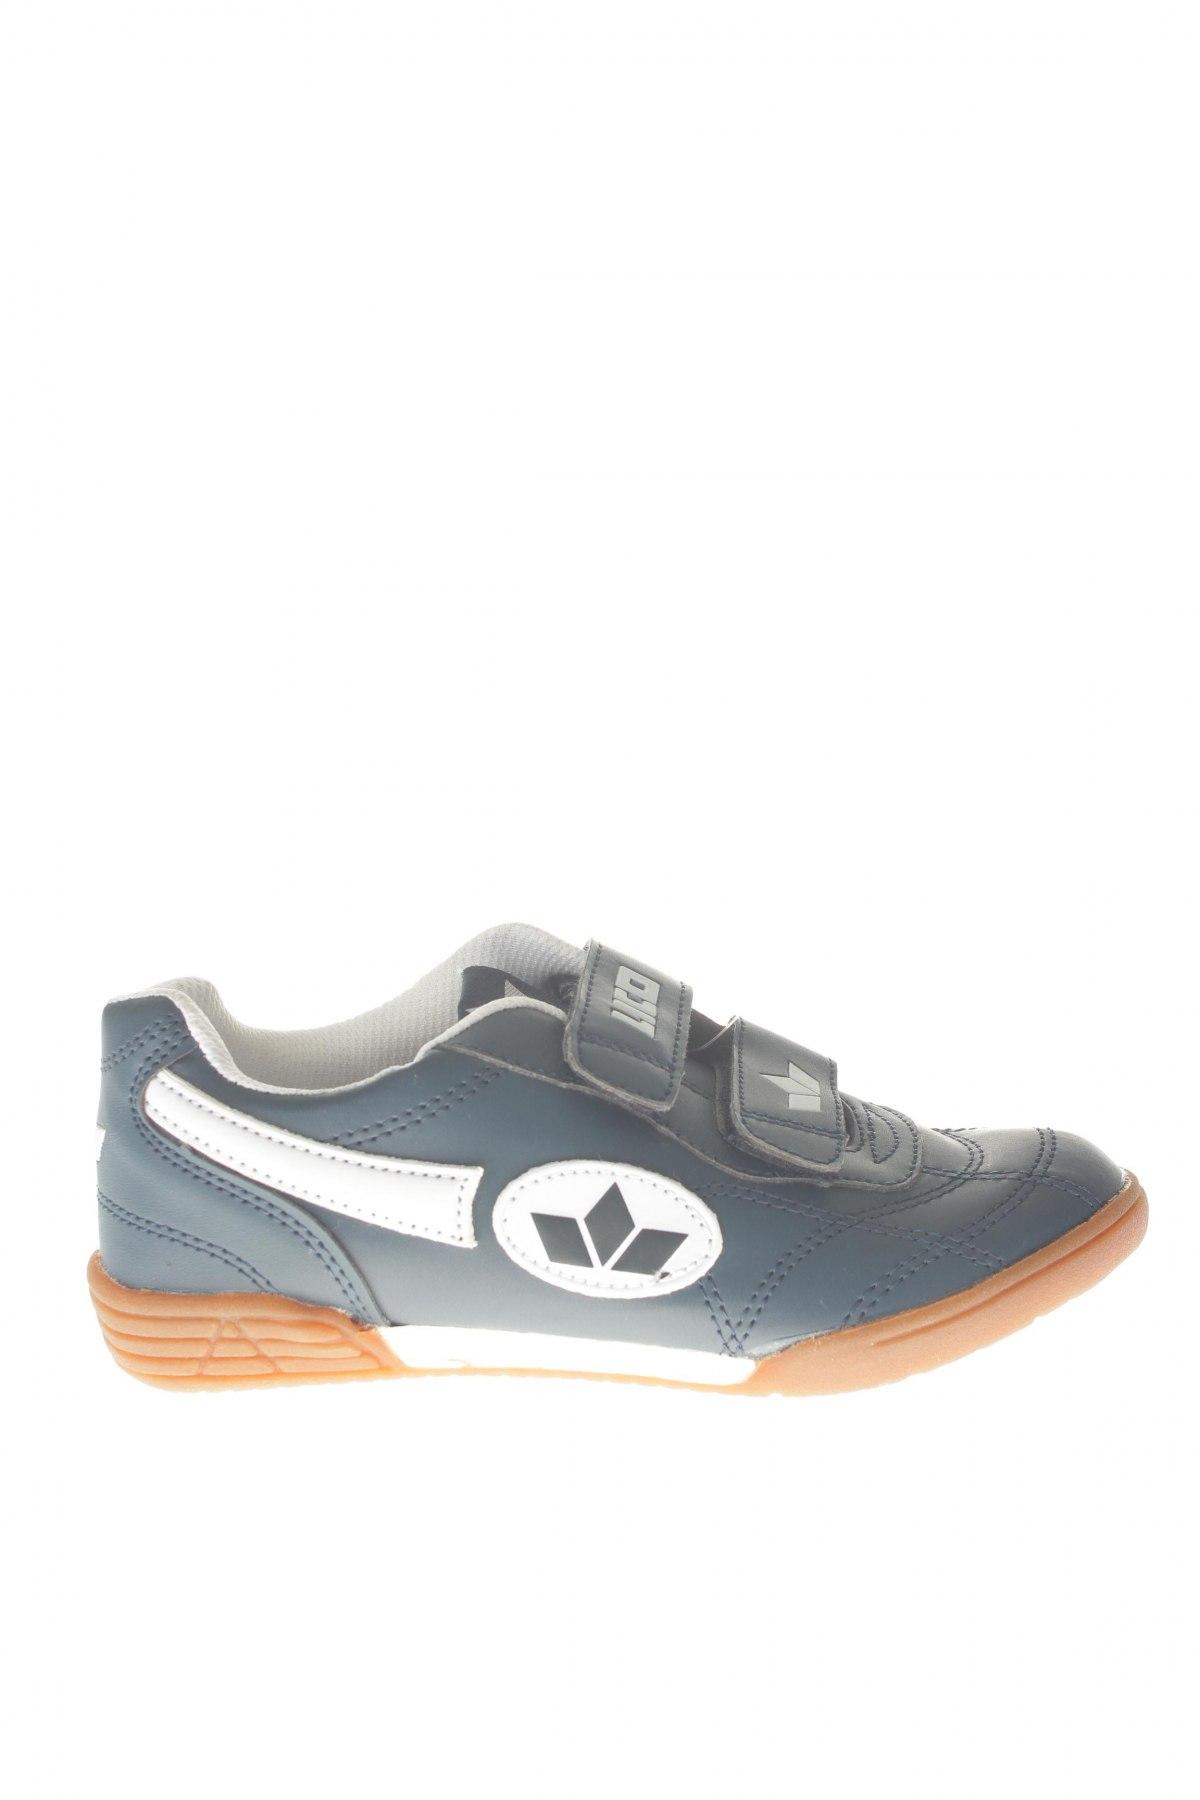 Gyerekcipők Lico - kedvező áron Remixben -  101188772 51a7b2bf9e